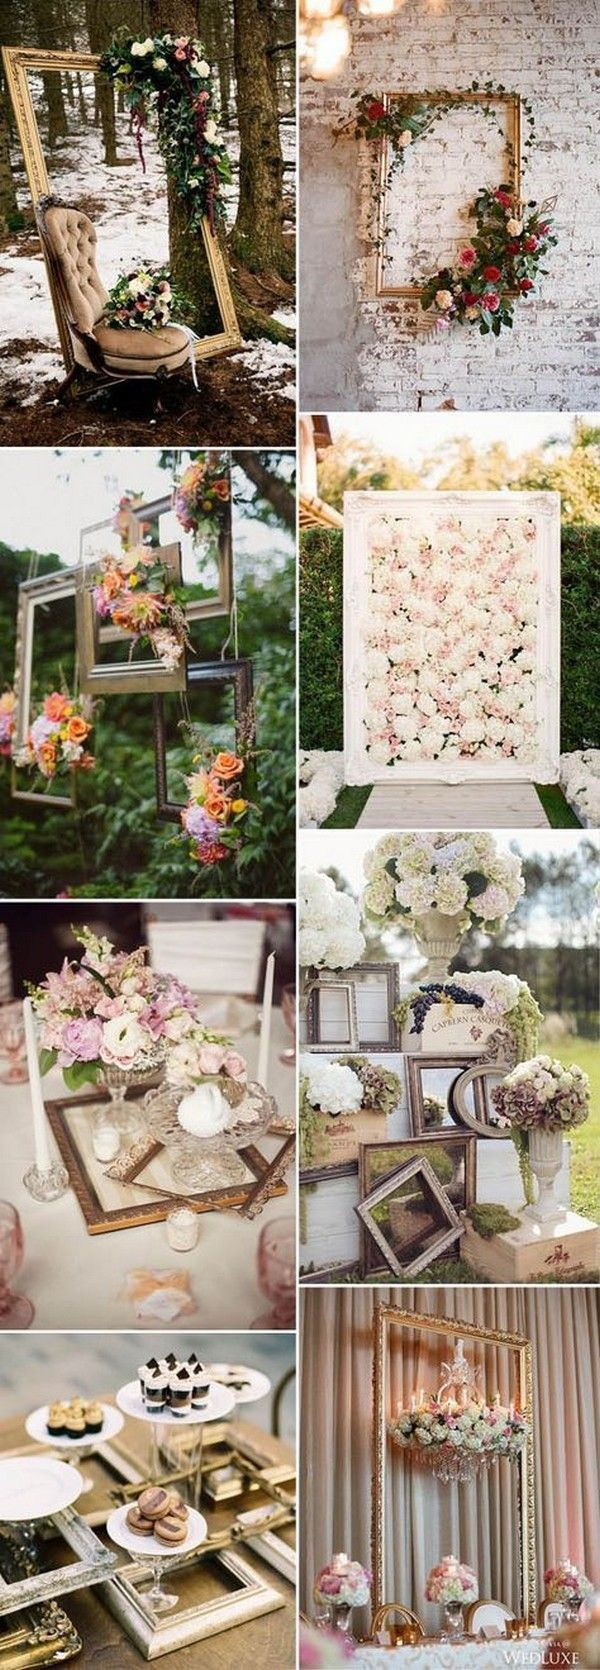 1950's wedding decorations november 2018 Best  Weddings  Shabby Chic Vintage u Rustic images on